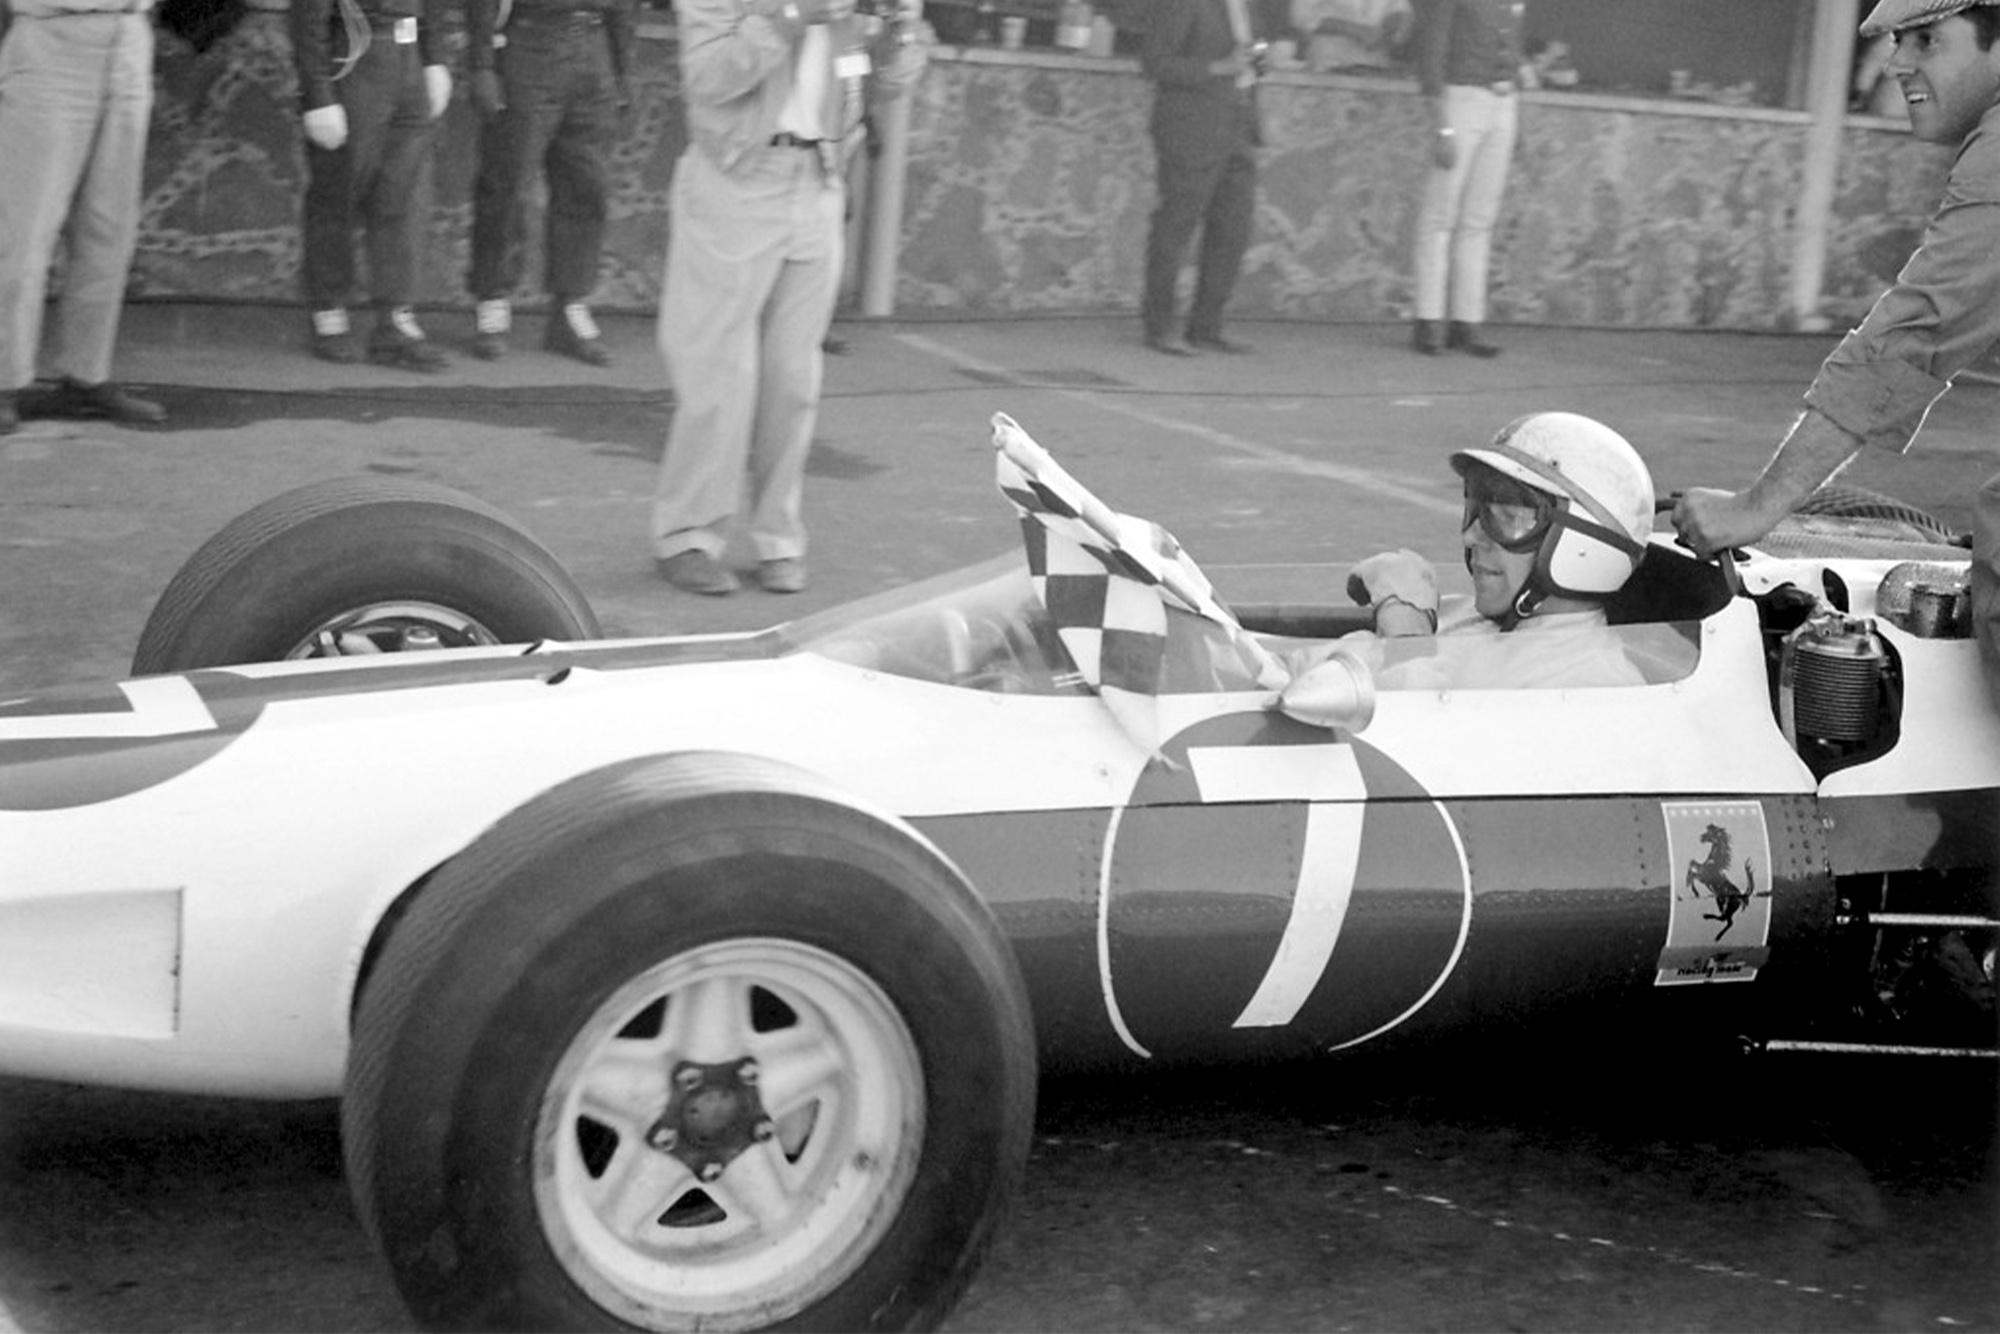 John Surtees after winning the 1964 Formula 1 world championship